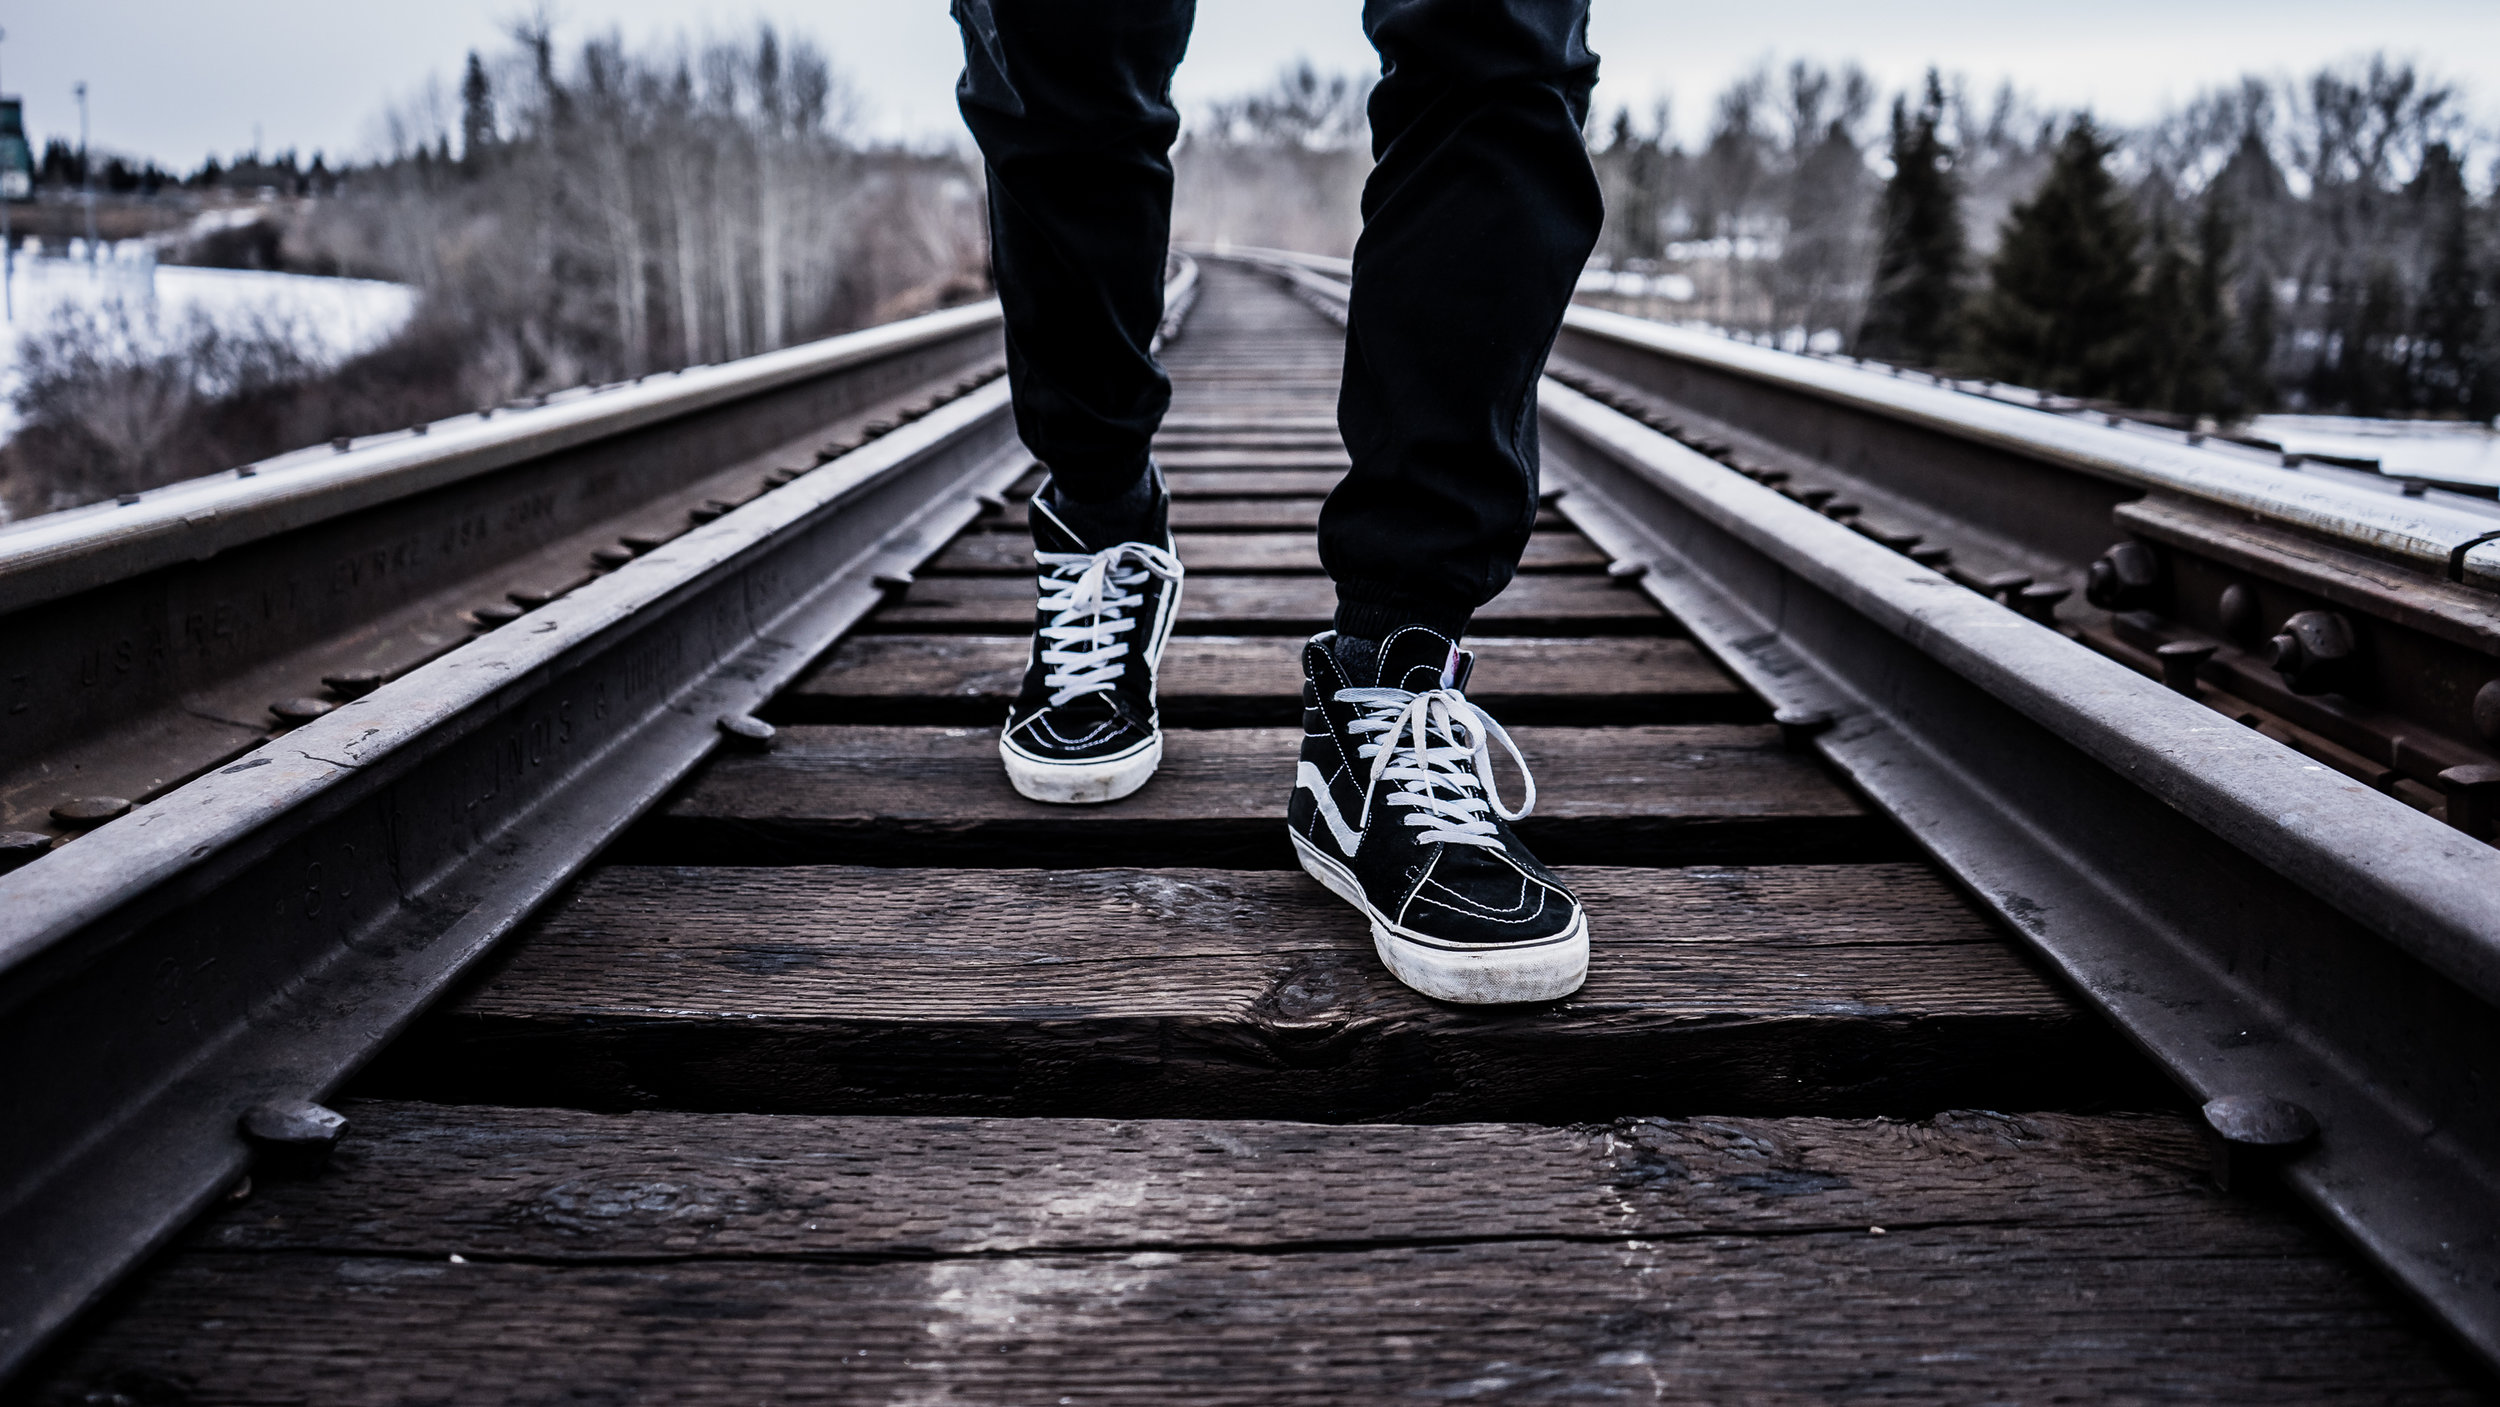 Walking on tracks.jpg